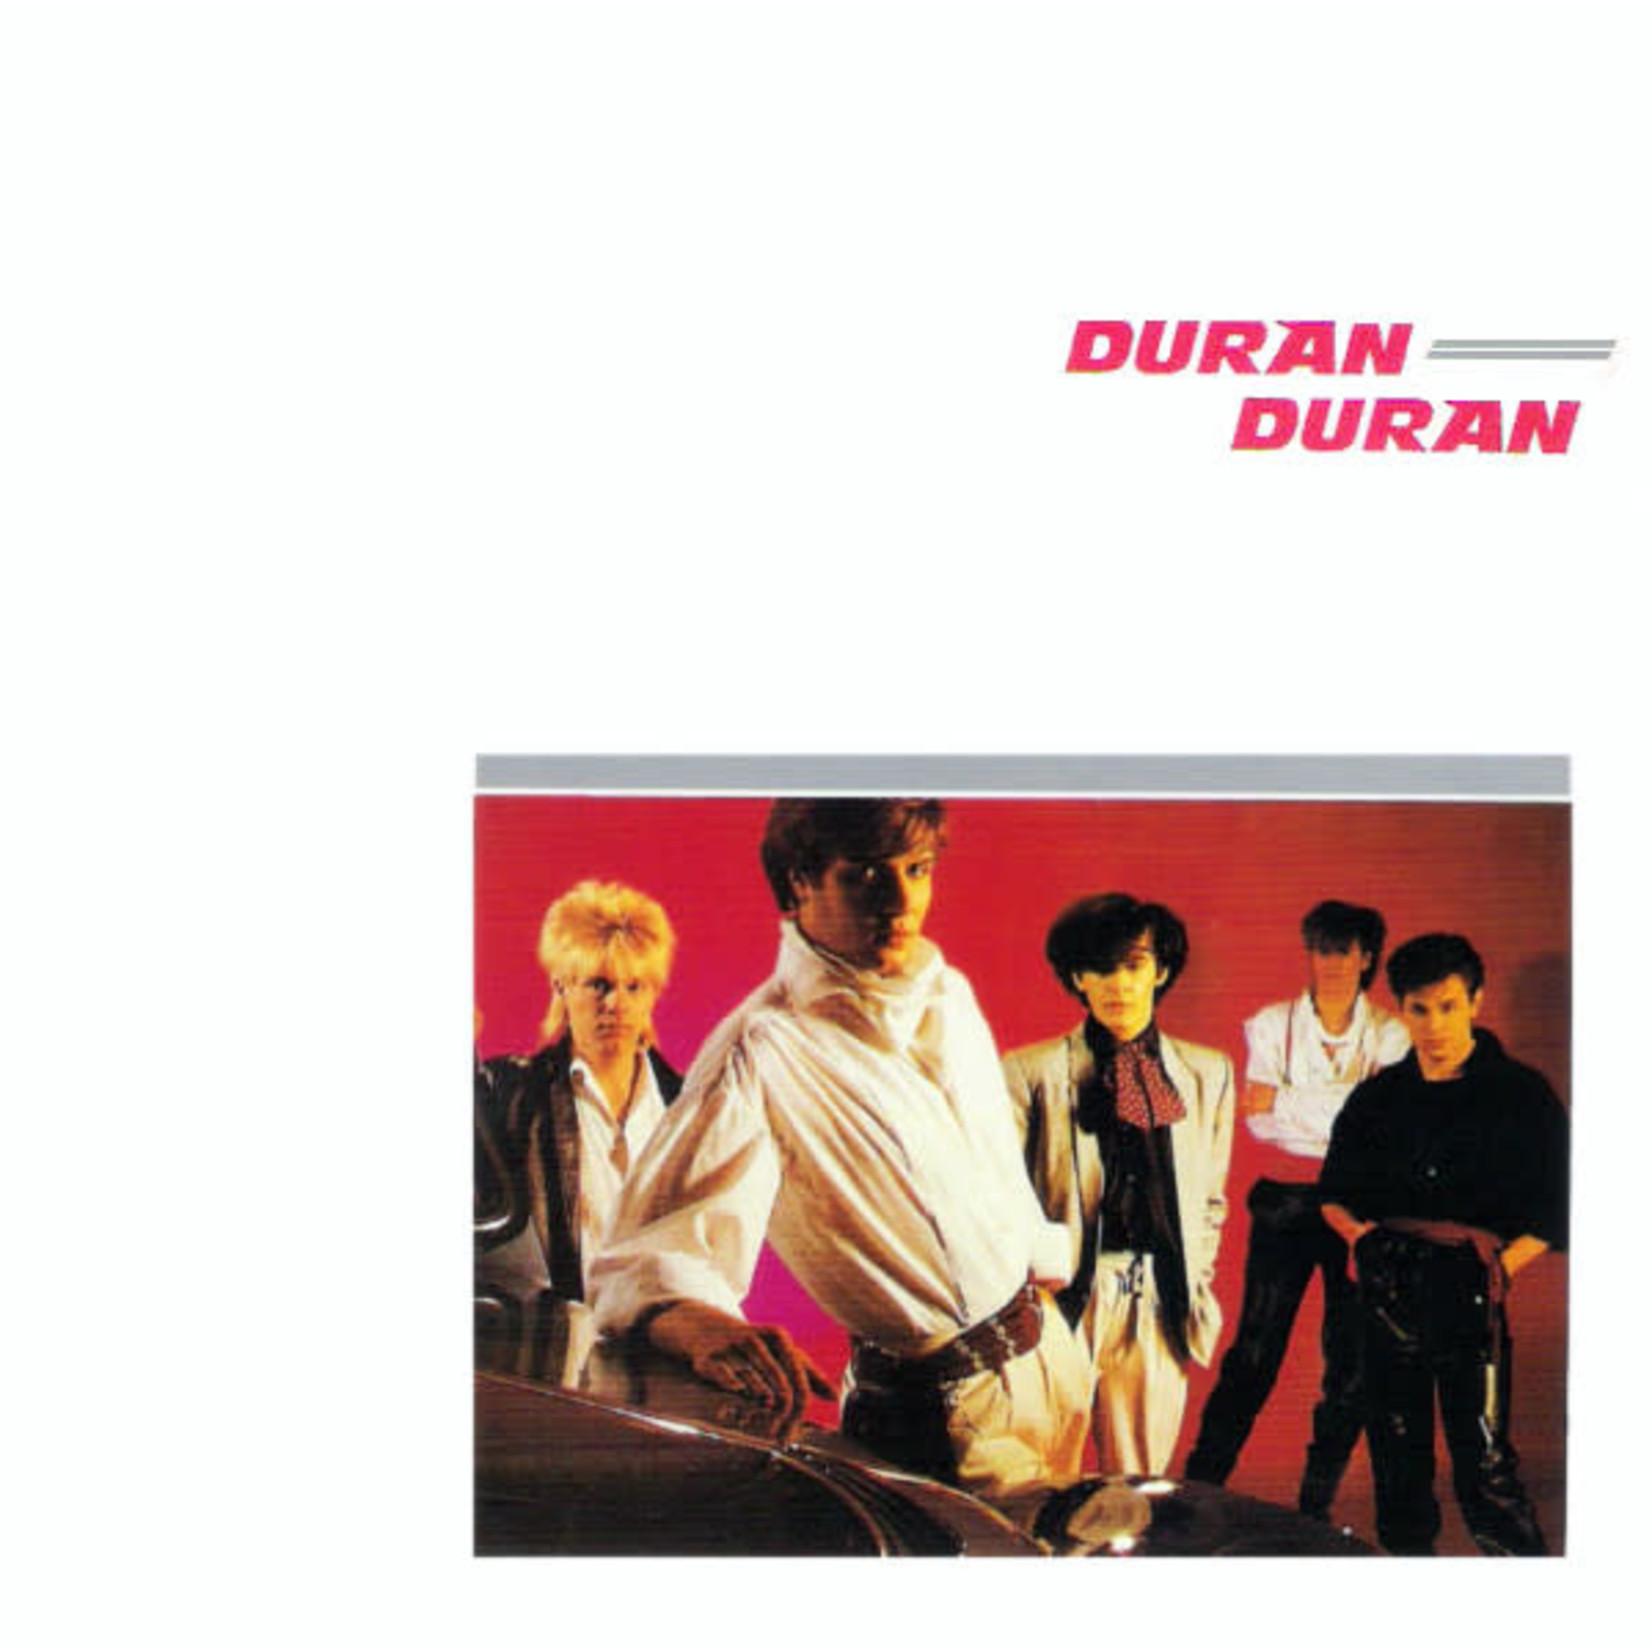 [Vintage] Duran Duran: self-titled